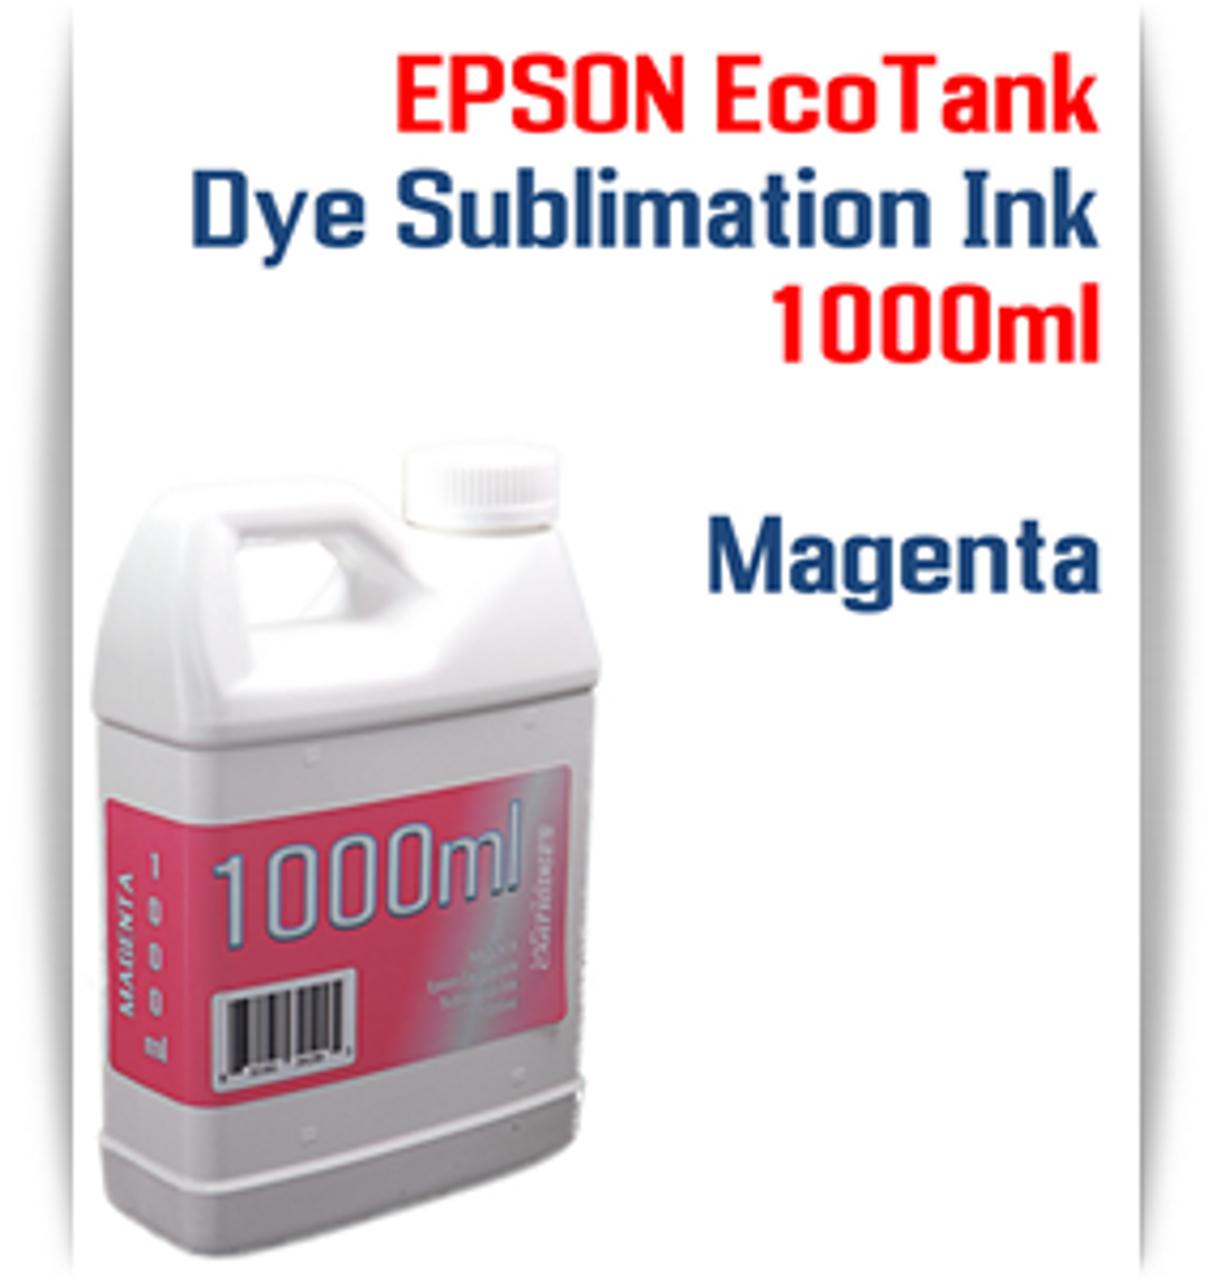 Magenta EPSON EcoTank printer Dye Sublimation Ink 1000ml bottle